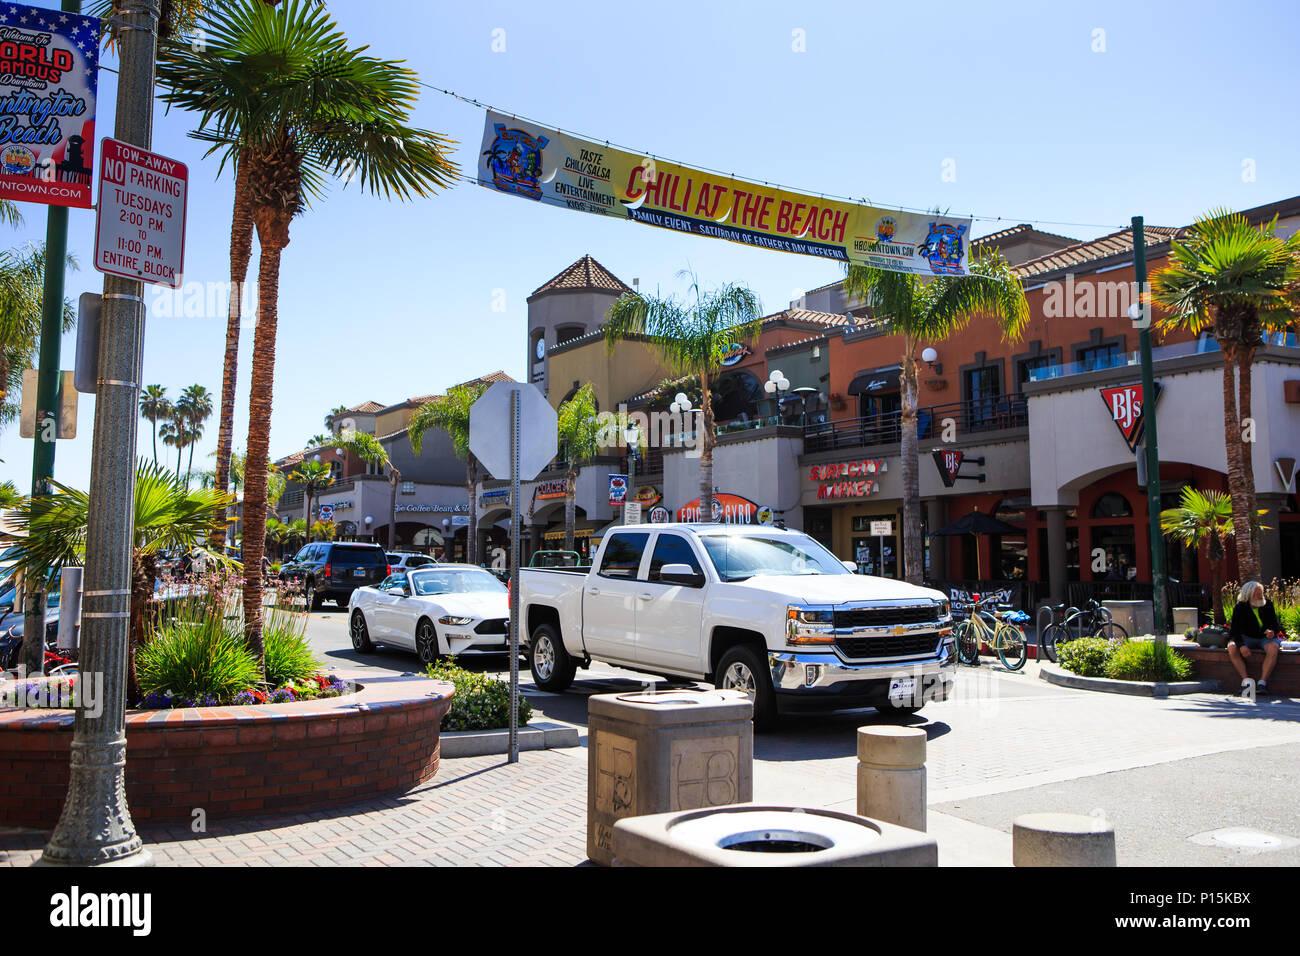 Restaurants And Outdoor Eating On Main Street Huntington Beach California Usa Stock Photo Alamy